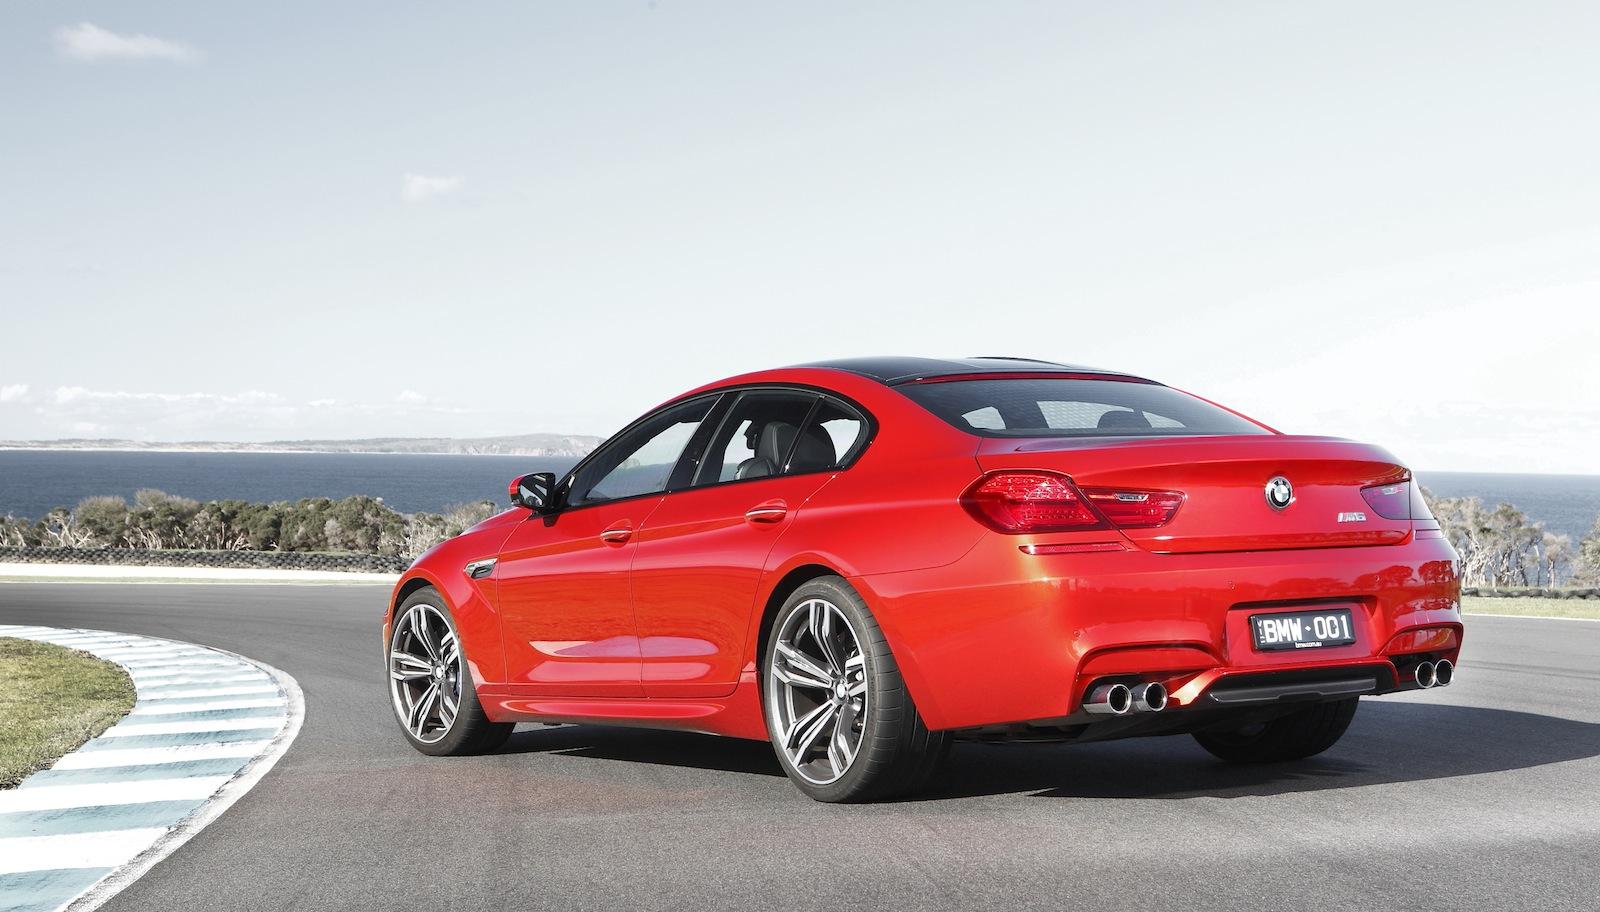 Bmw M6 Gran Coupe >> BMW M6 Gran Coupe Review - photos | CarAdvice